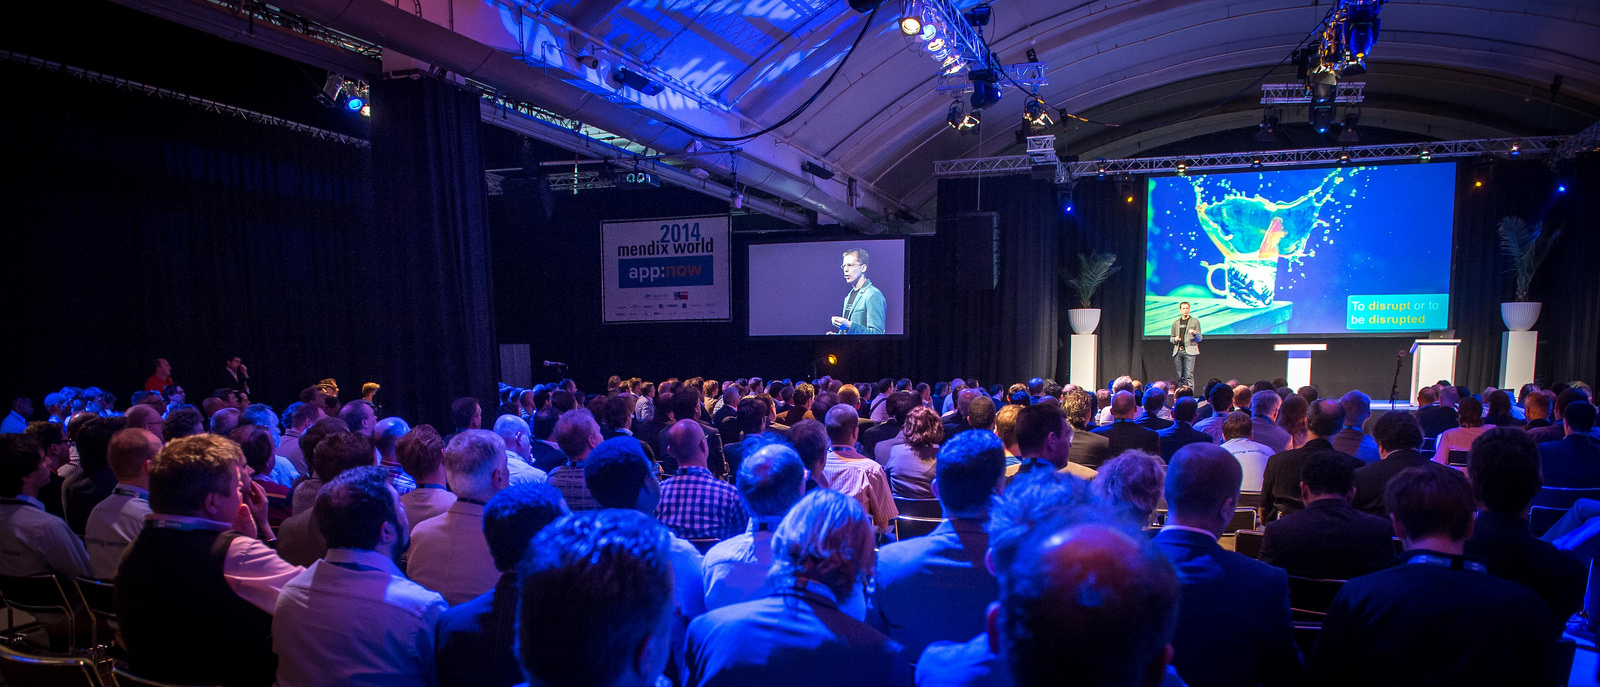 Mendix World 2014 keynote